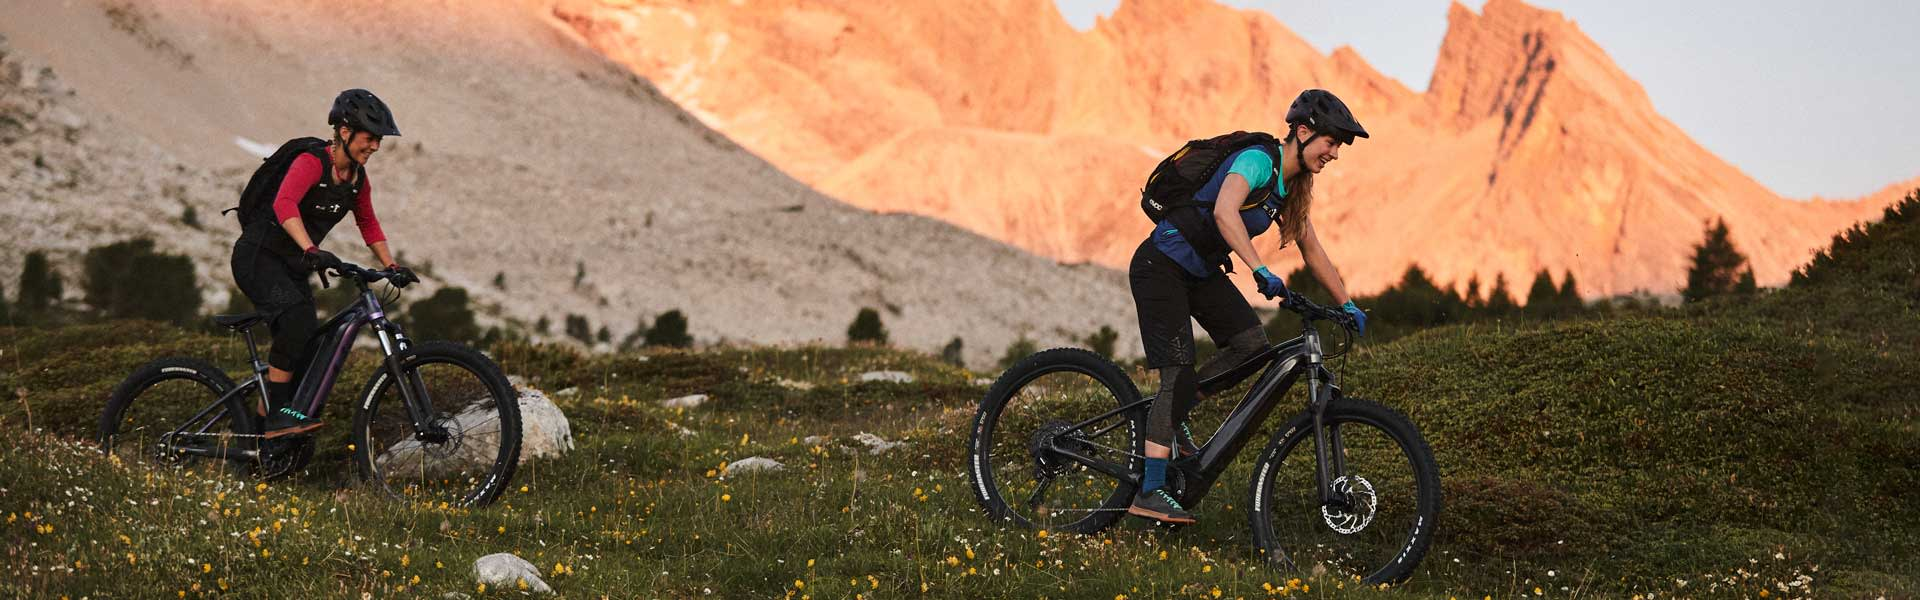 Enchant 2 24 (2019) | Damen Recreation Fahrrad | Liv Cycling